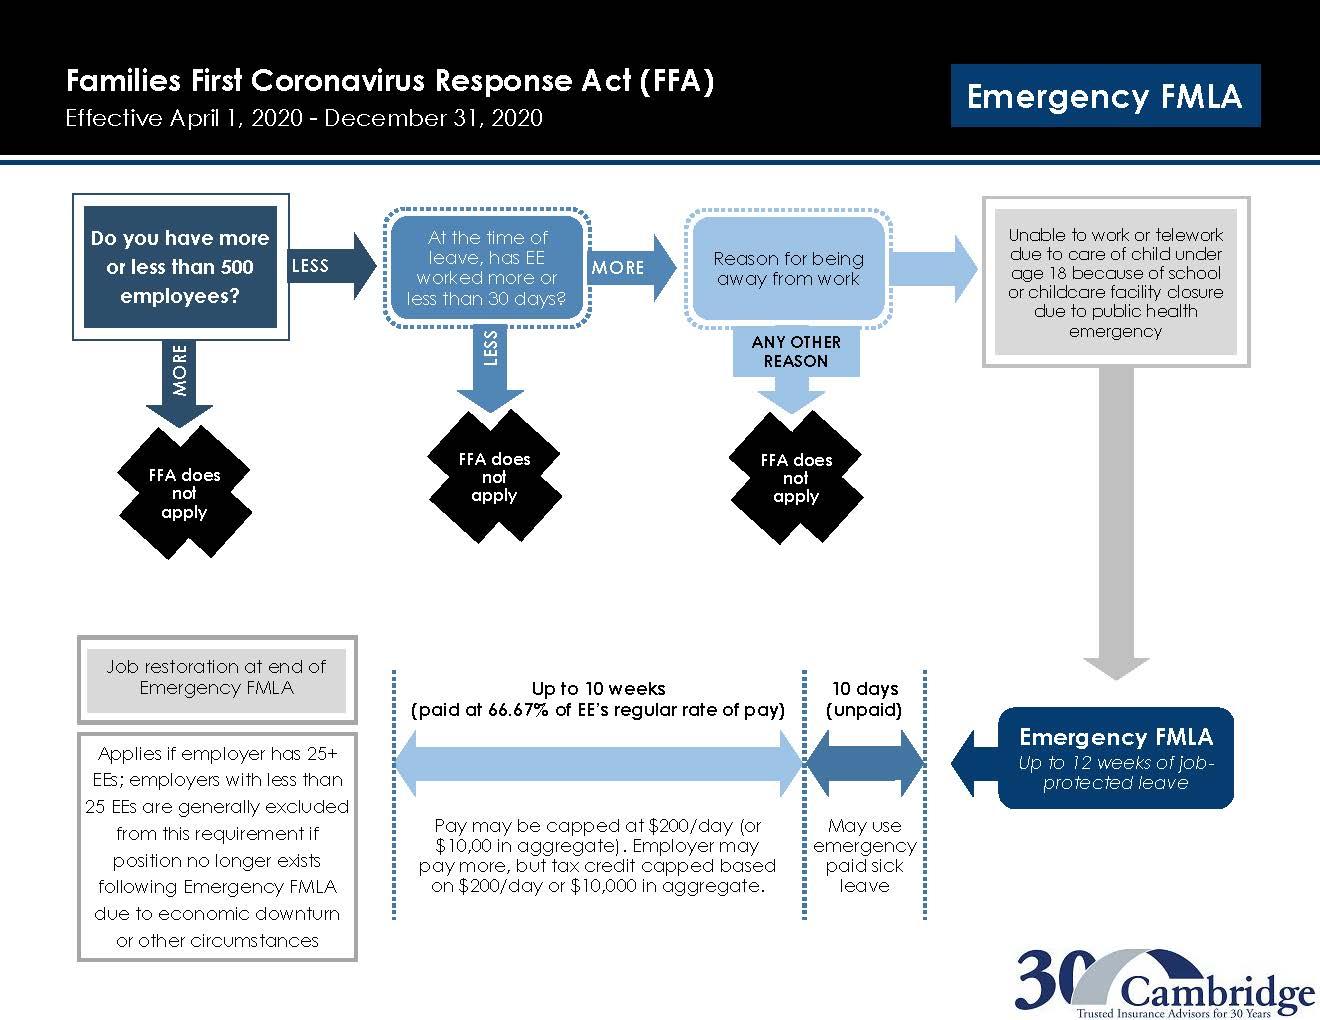 Families First Coronavirus Response Act (FFA) Emergency FLA Flow Chart